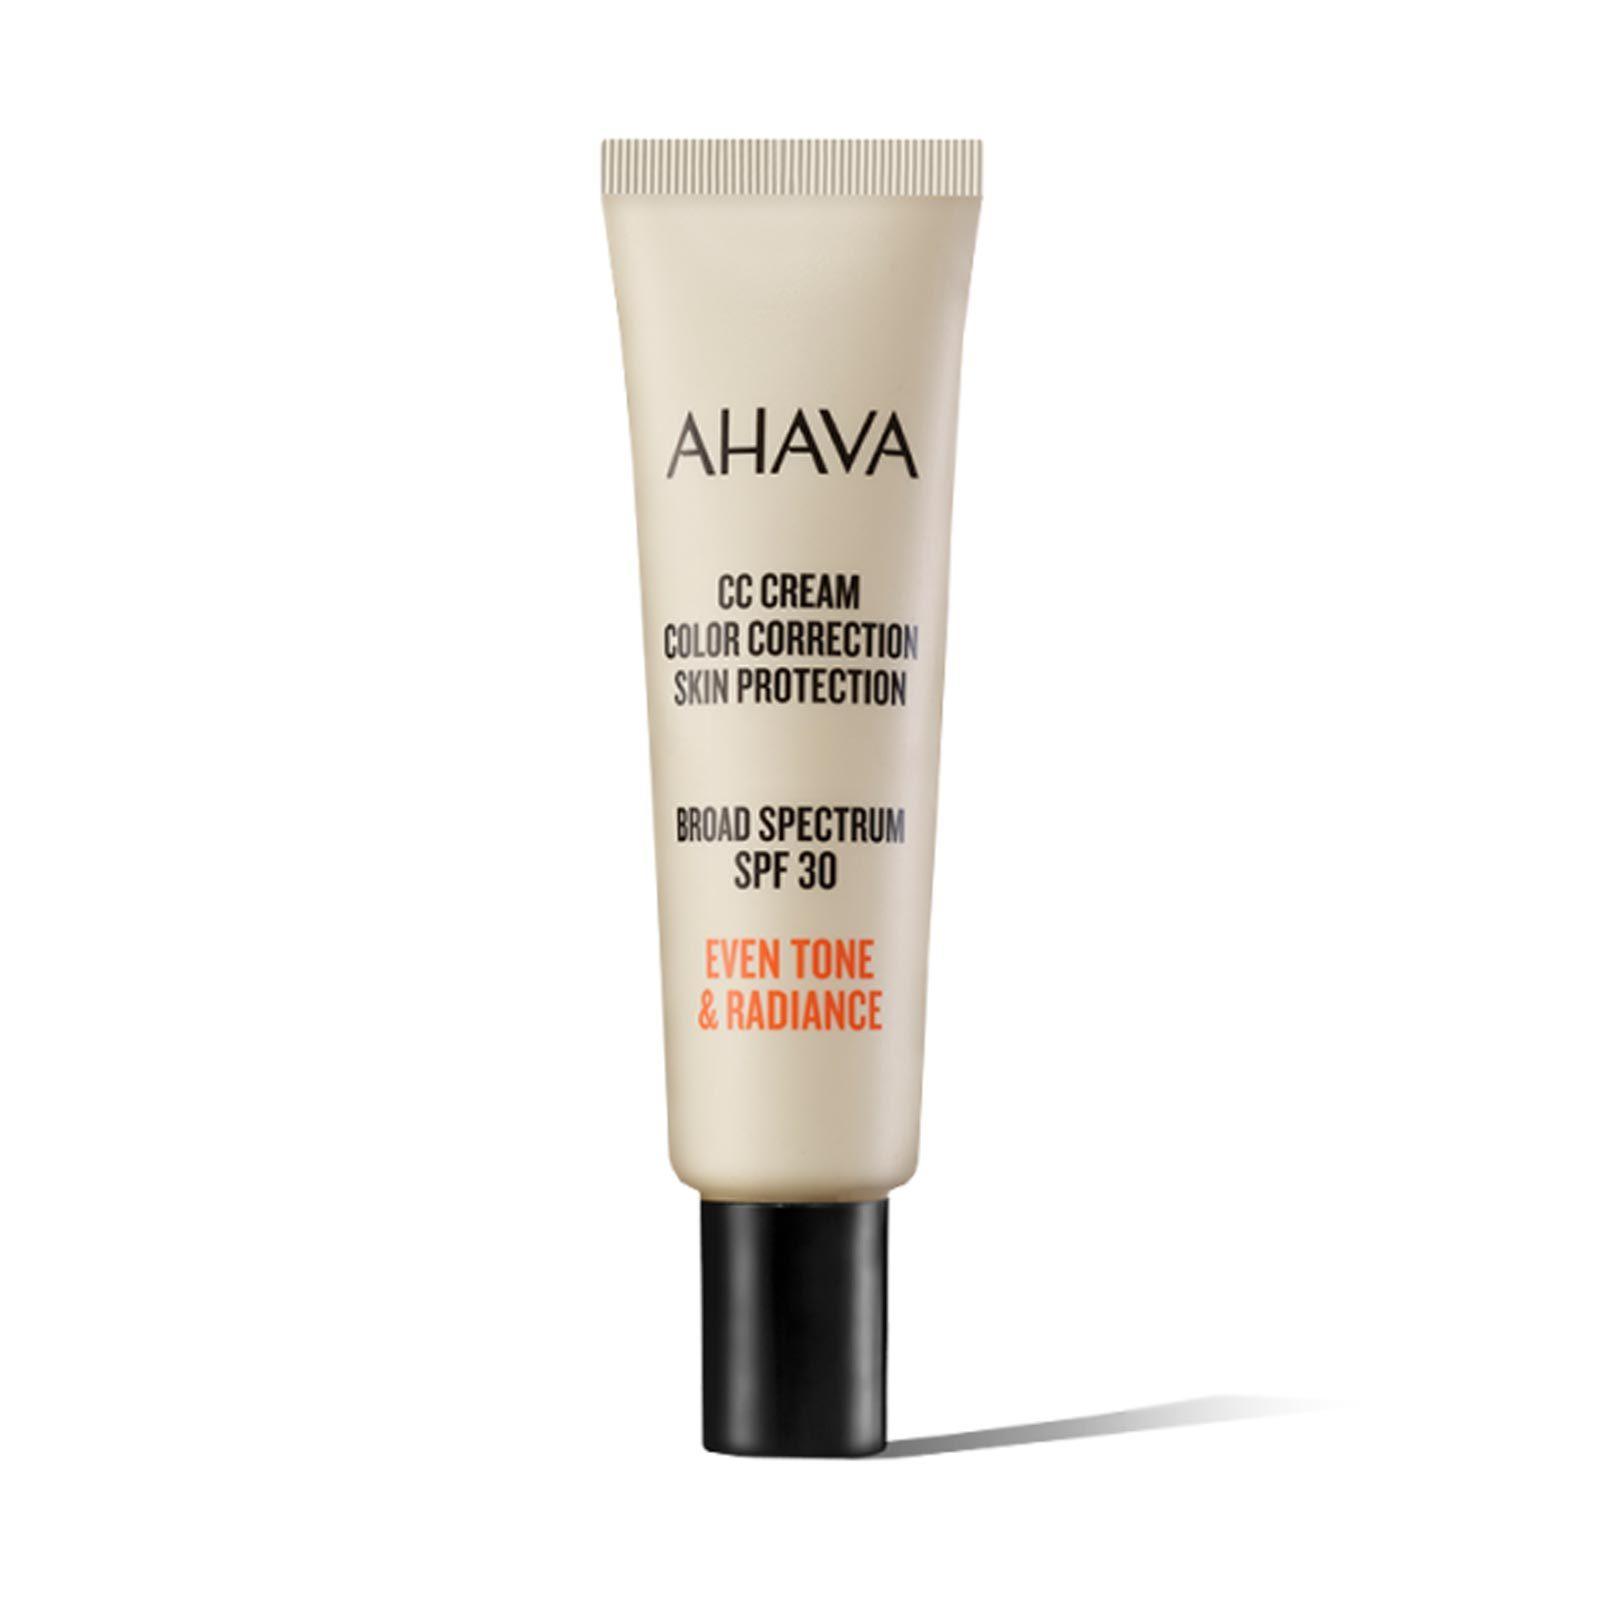 Ahava CC Cream Color Correction Skin Protection SPF 30